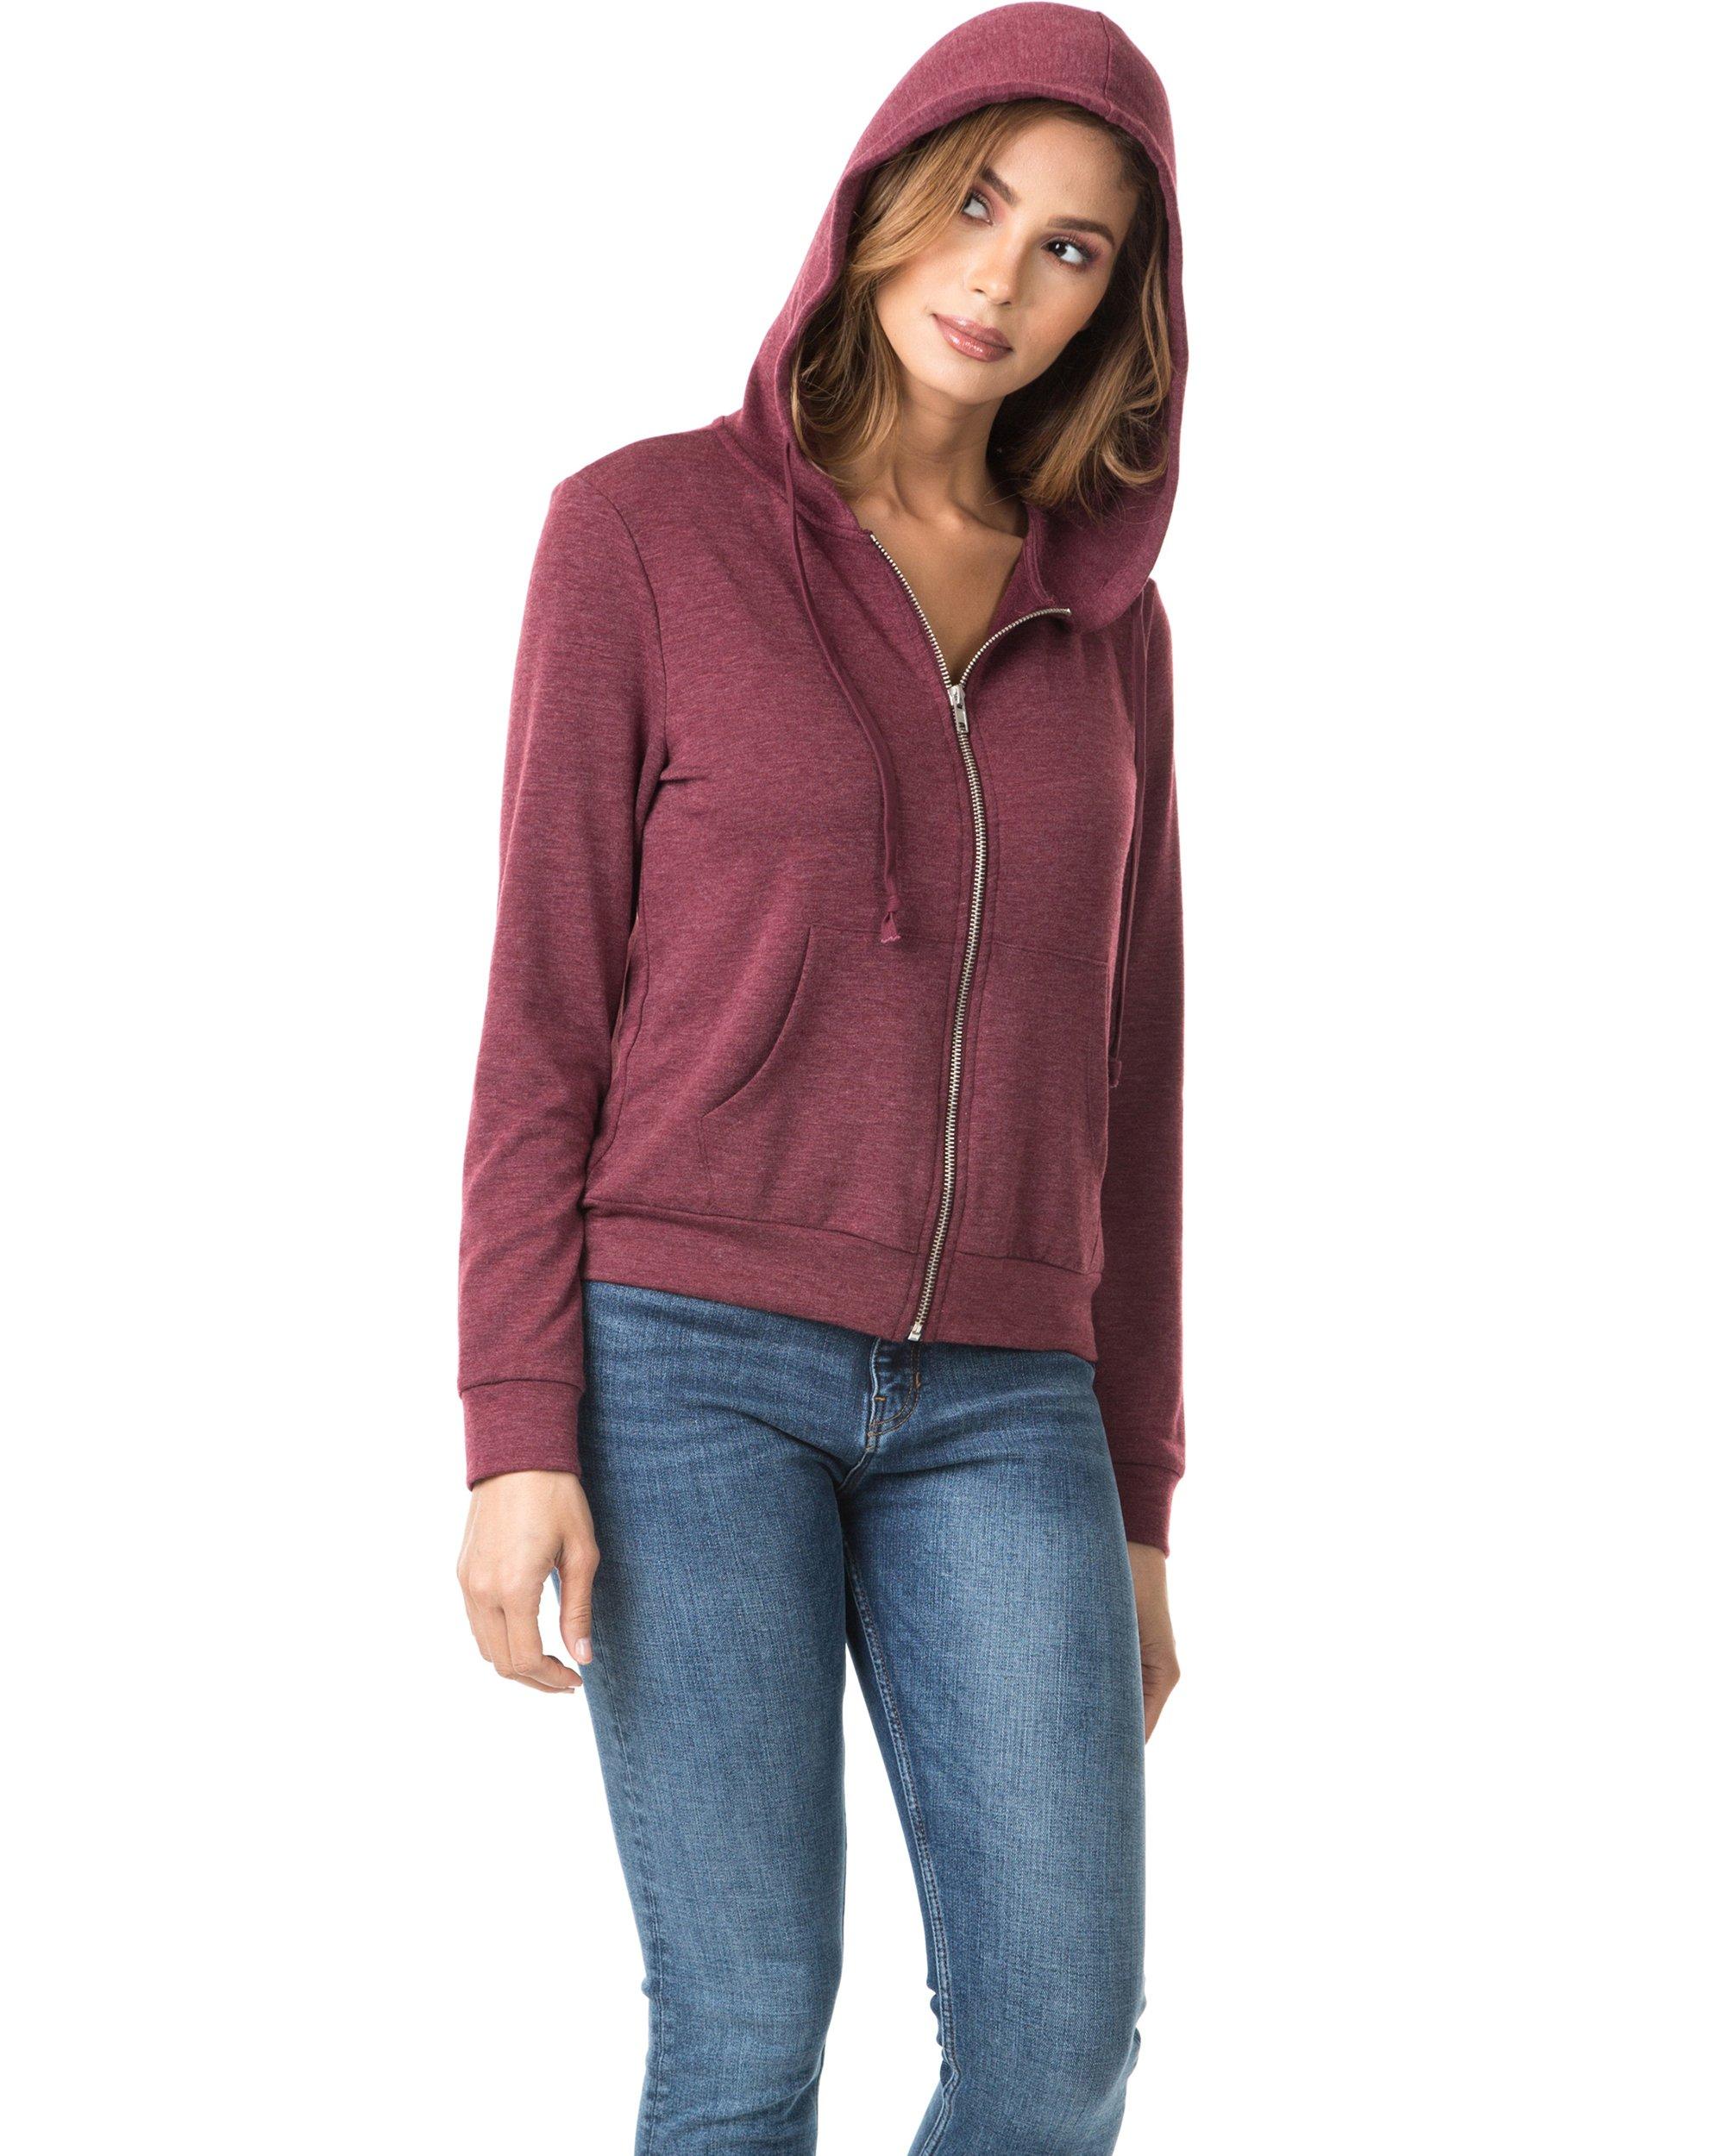 Nolabel B7_032 Women's Long Sleeve French Terry Drawstring Hoodies Zip Up Sweatshirt Hooded (Burgundy/5XL) by Nolabel (Image #4)